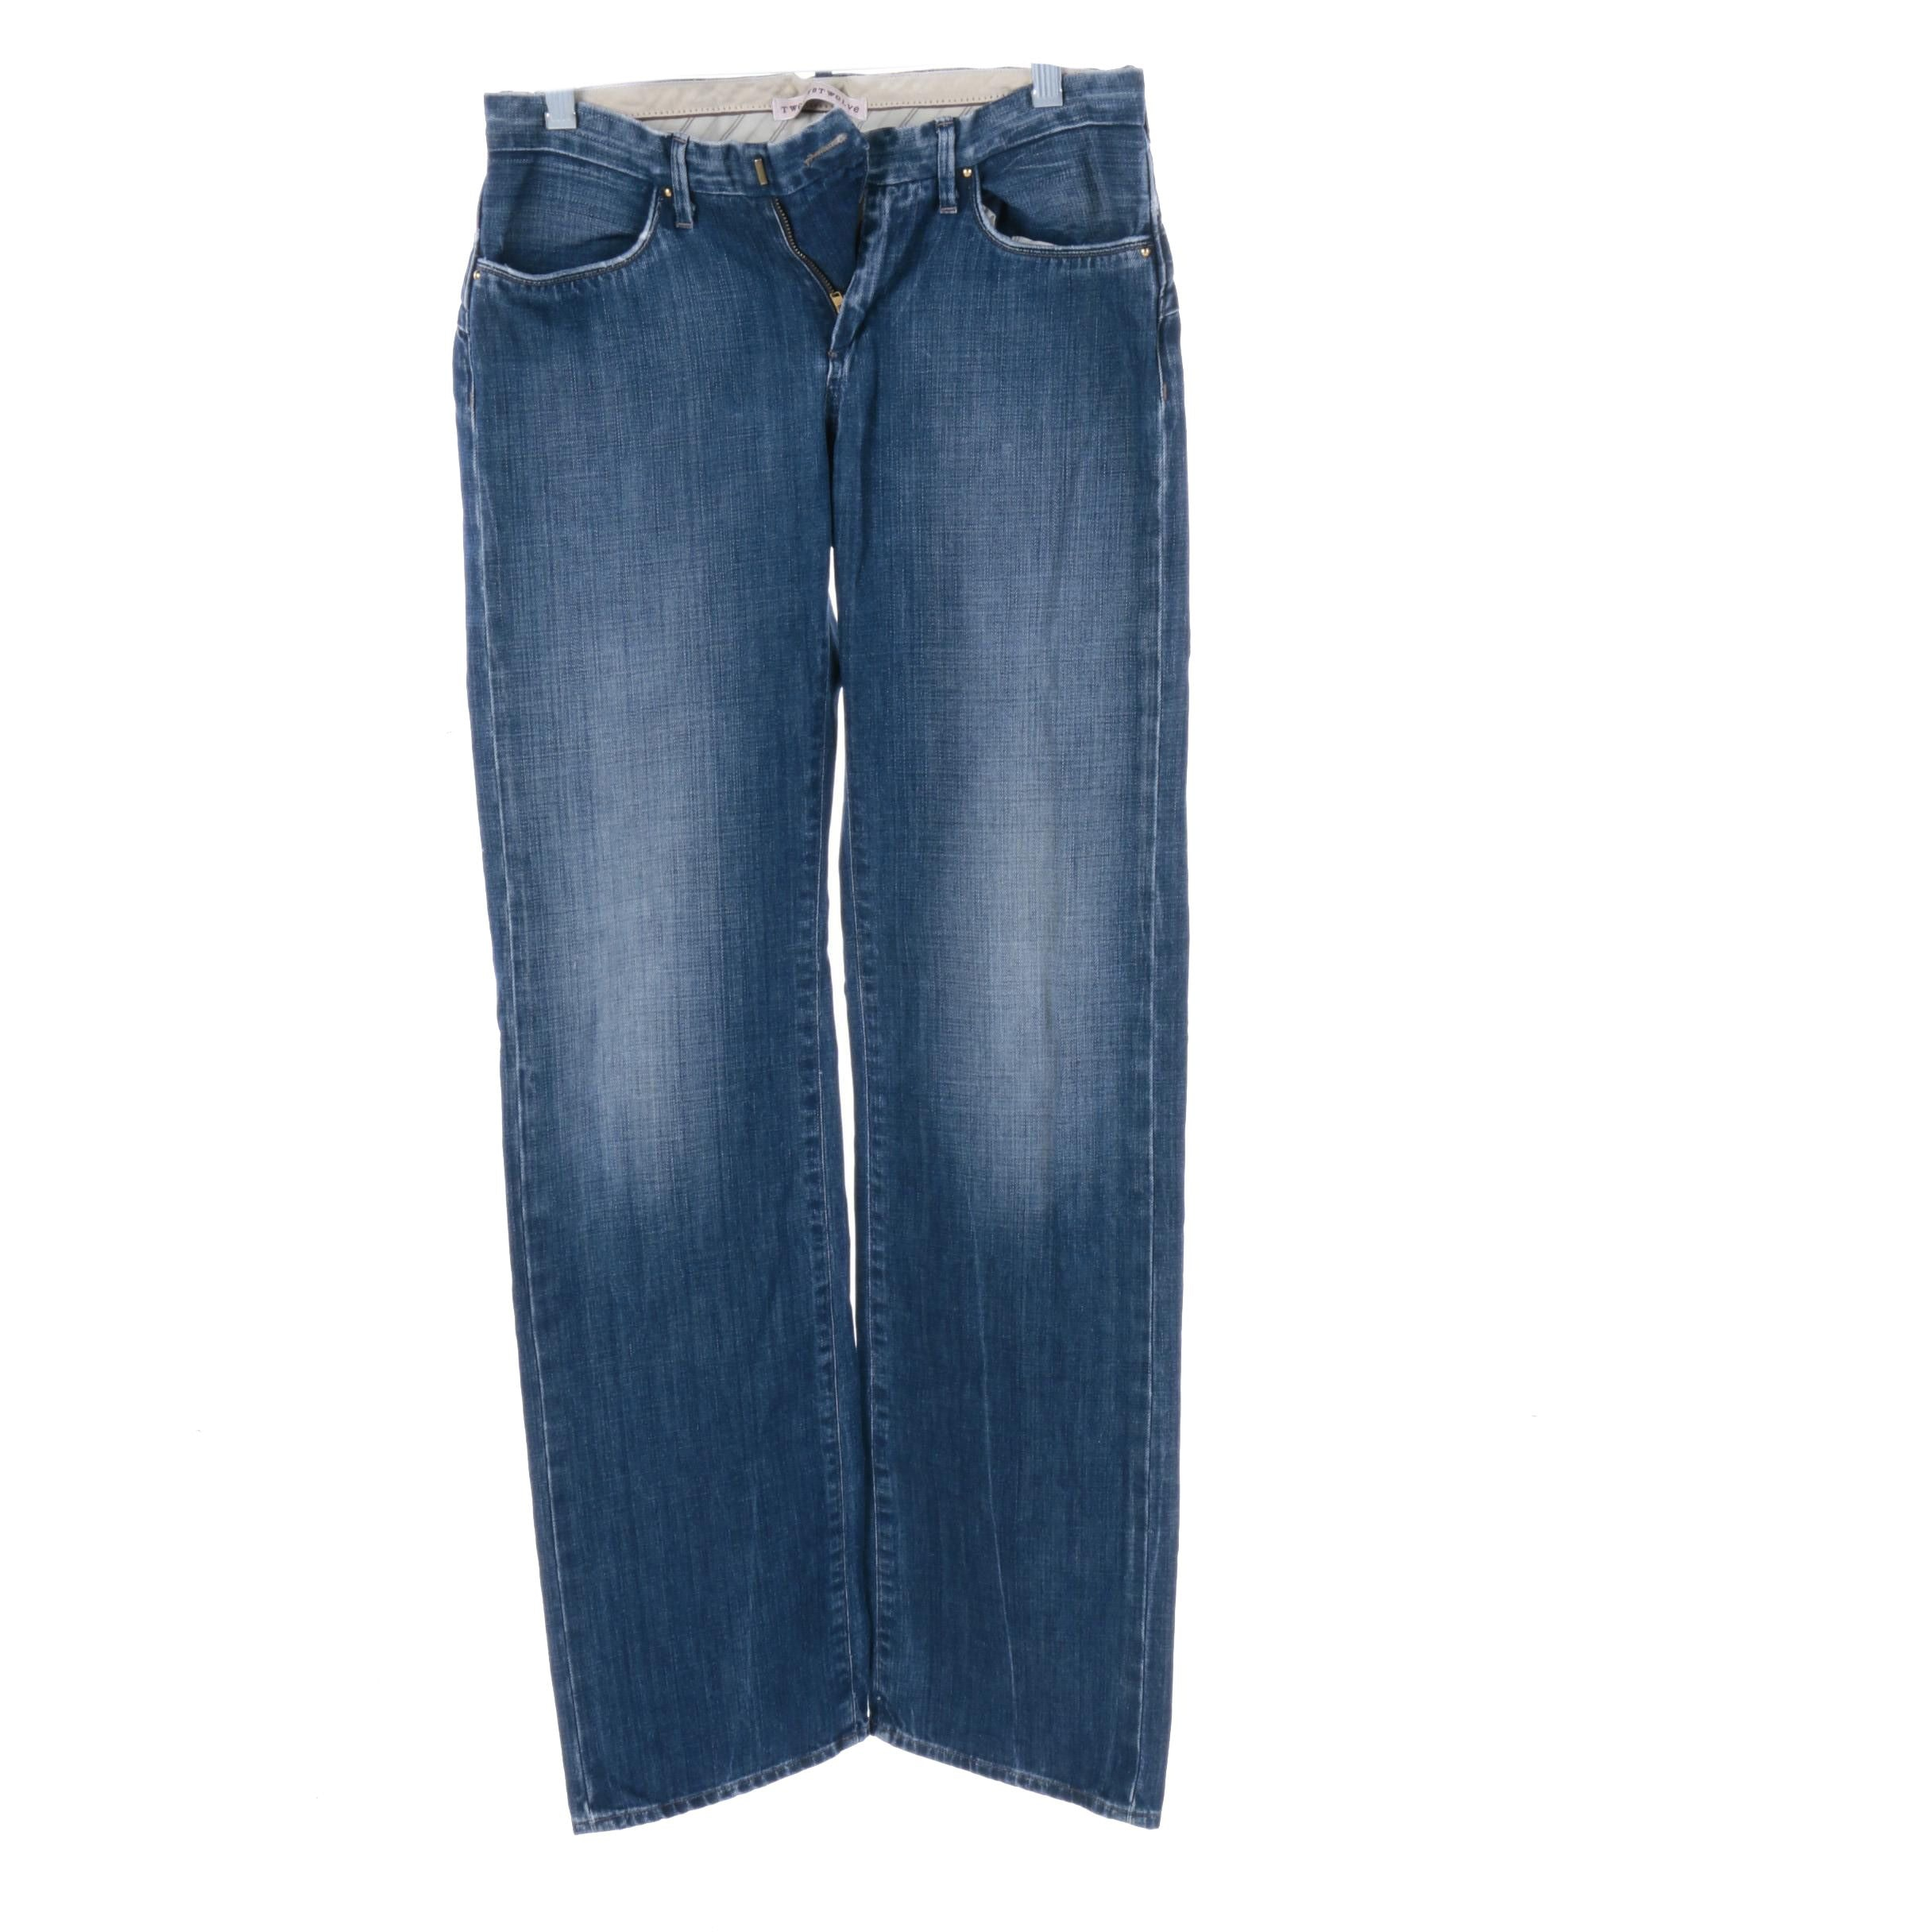 Women's Twenty8Twelve by S.Millerm Denim Jeans